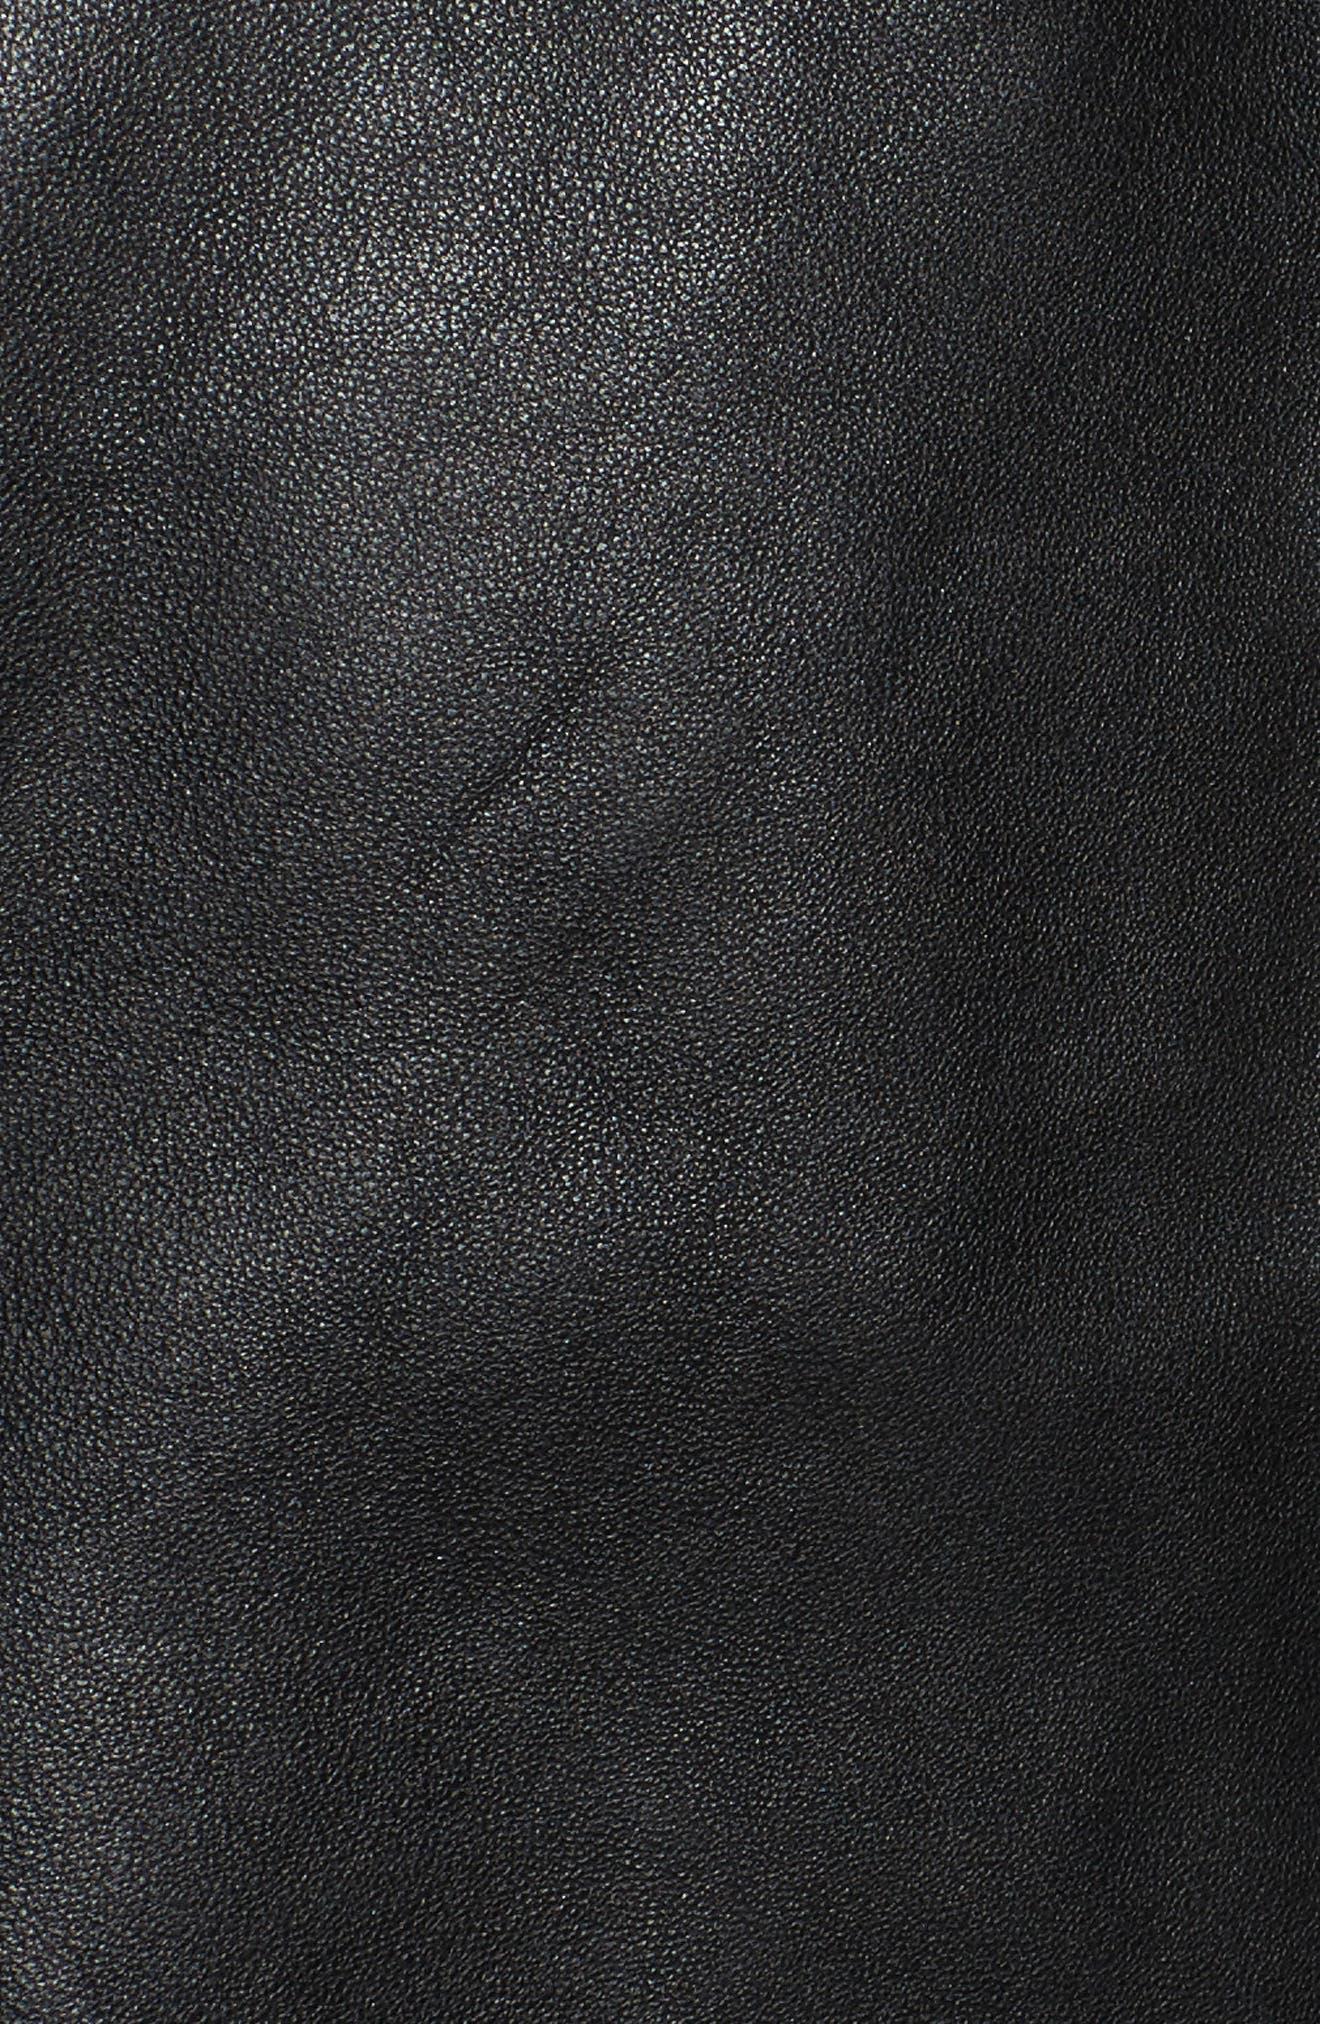 Whitney Washed Leather Crop Jacket,                             Alternate thumbnail 6, color,                             Black